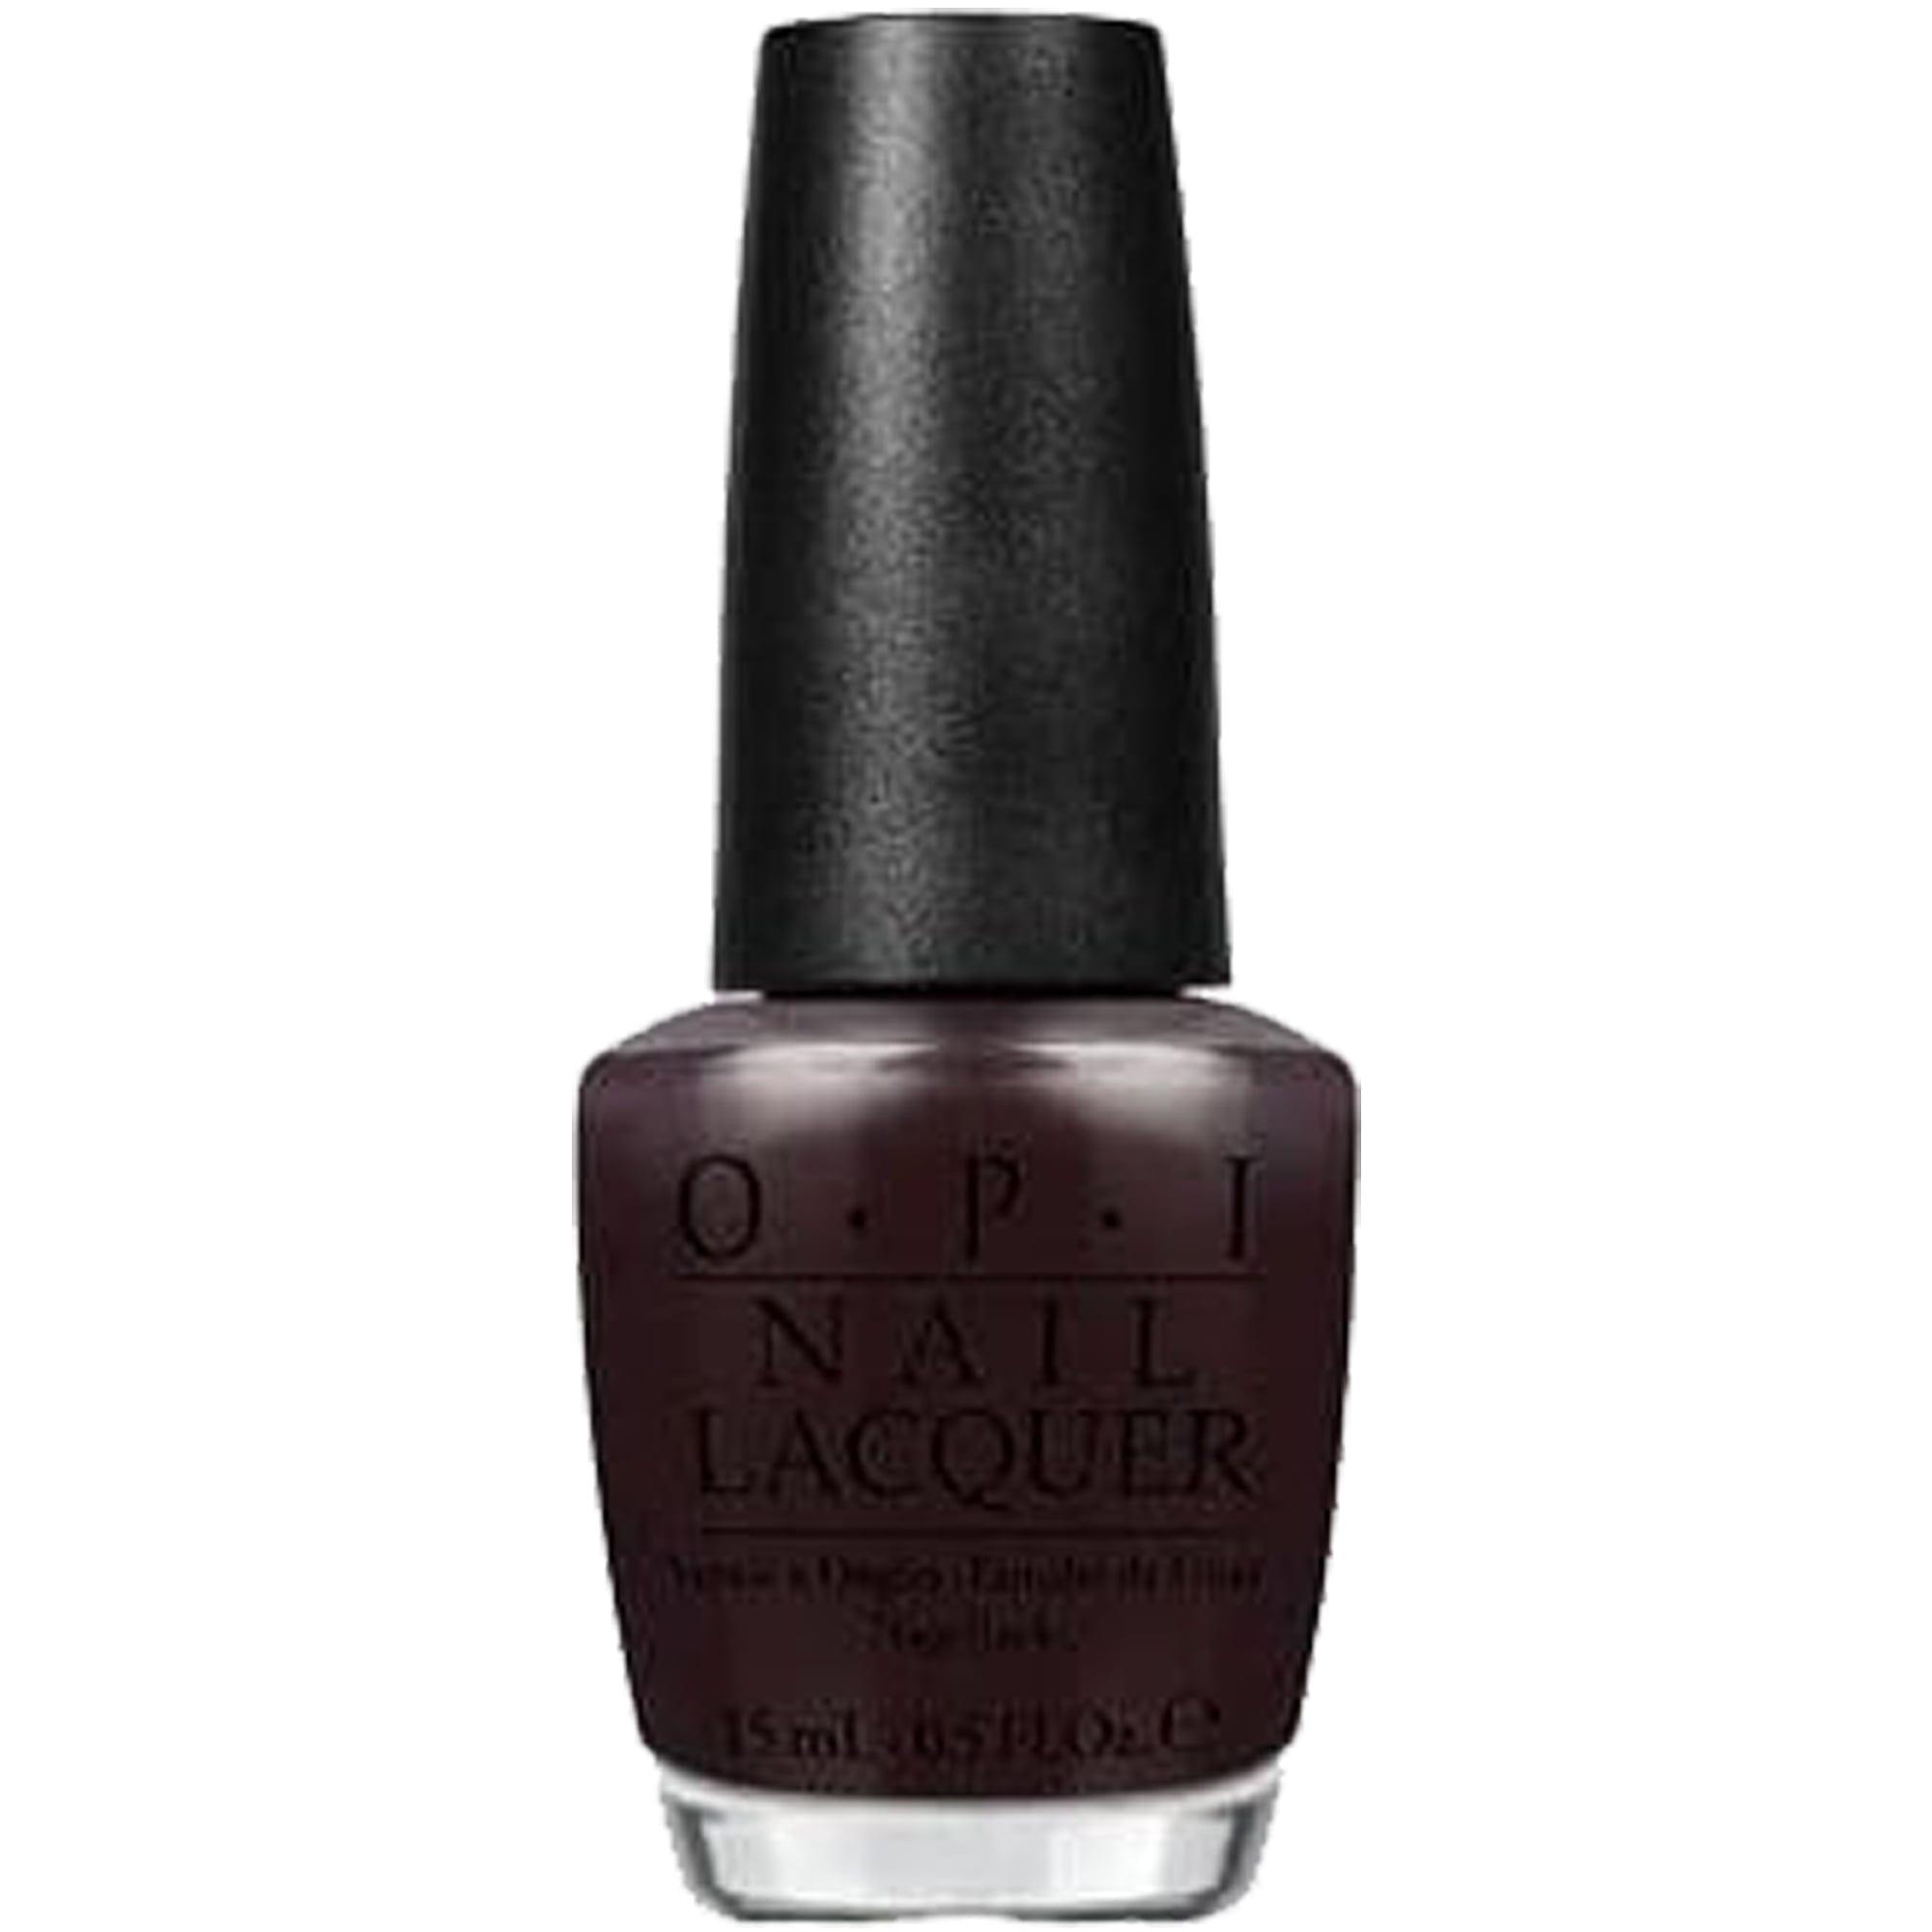 OPI Nail Lacquer Nail Polish 15ml HR F06 Love Is Hot and Coal ...